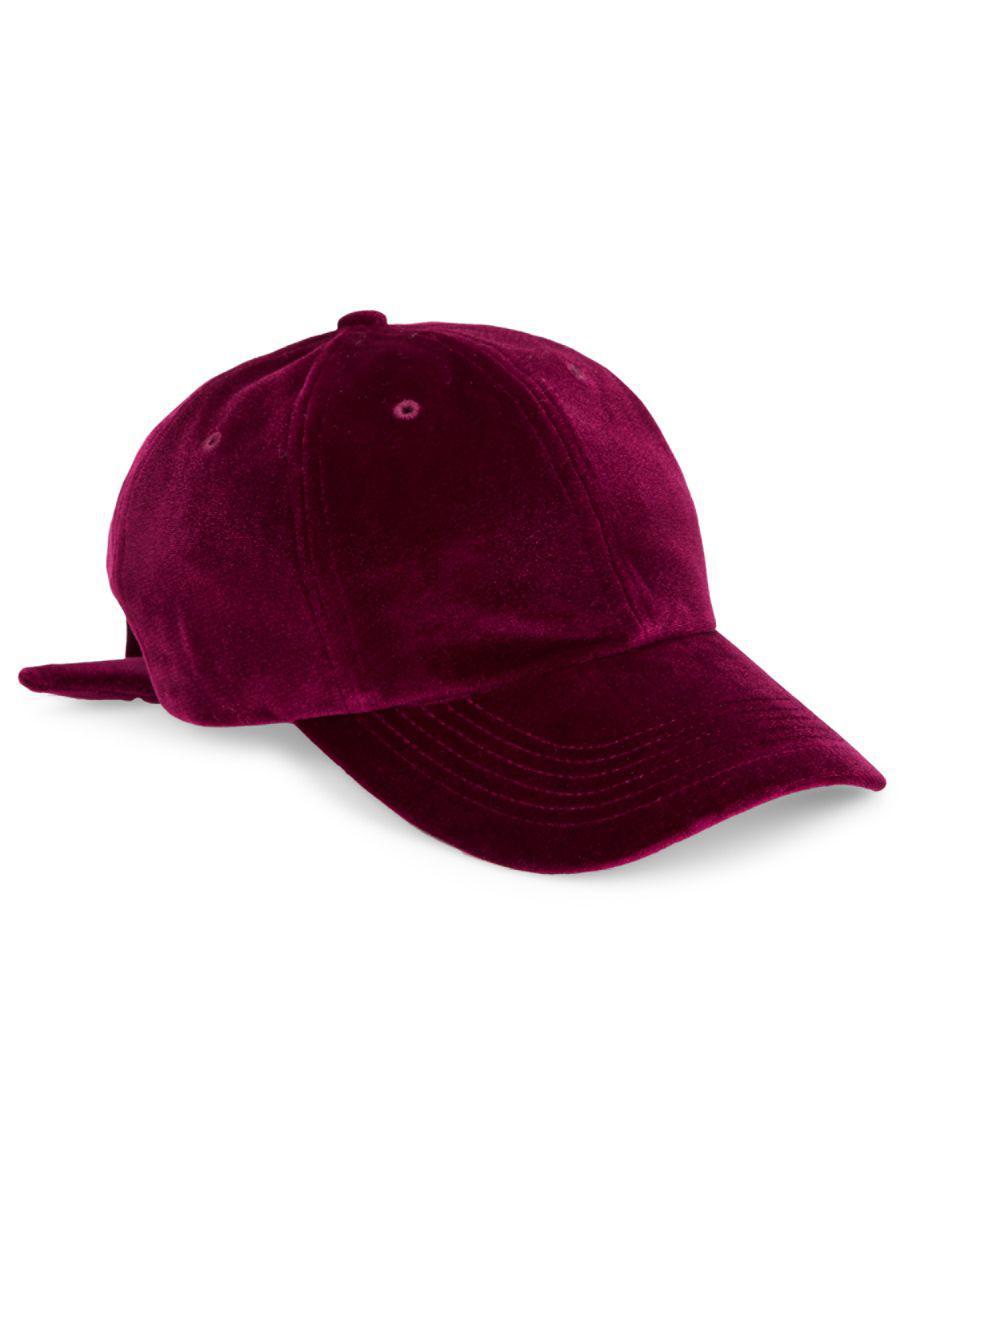 b6fedc6fb39 San Diego Hat Company. Women s Velvet Bow Back Baseball Cap